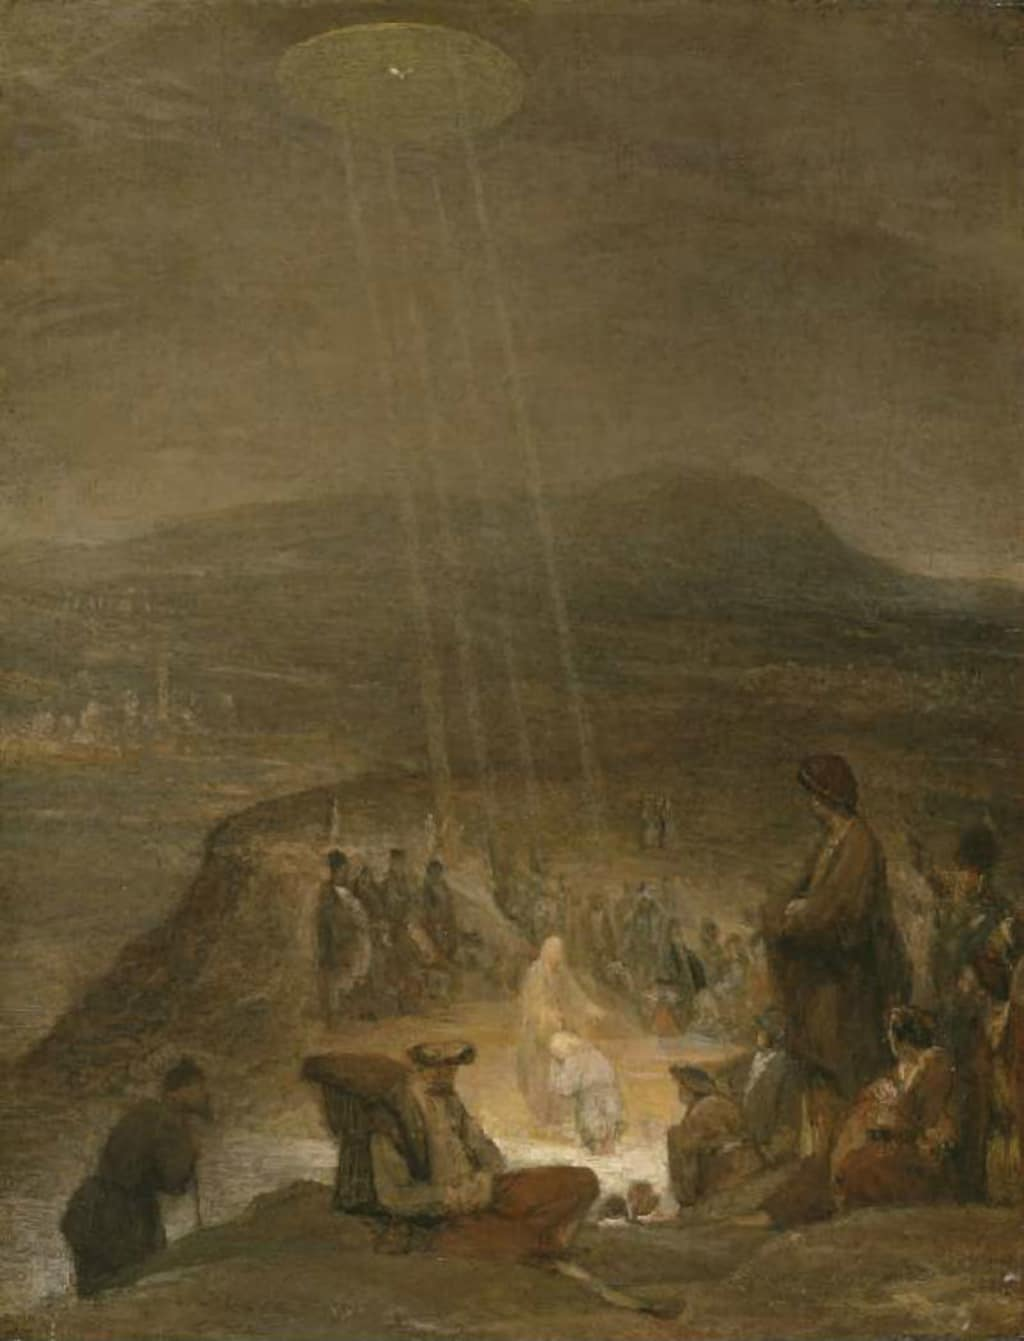 UFO 'Baptizes' Jesus Christ in 18th Century Painting